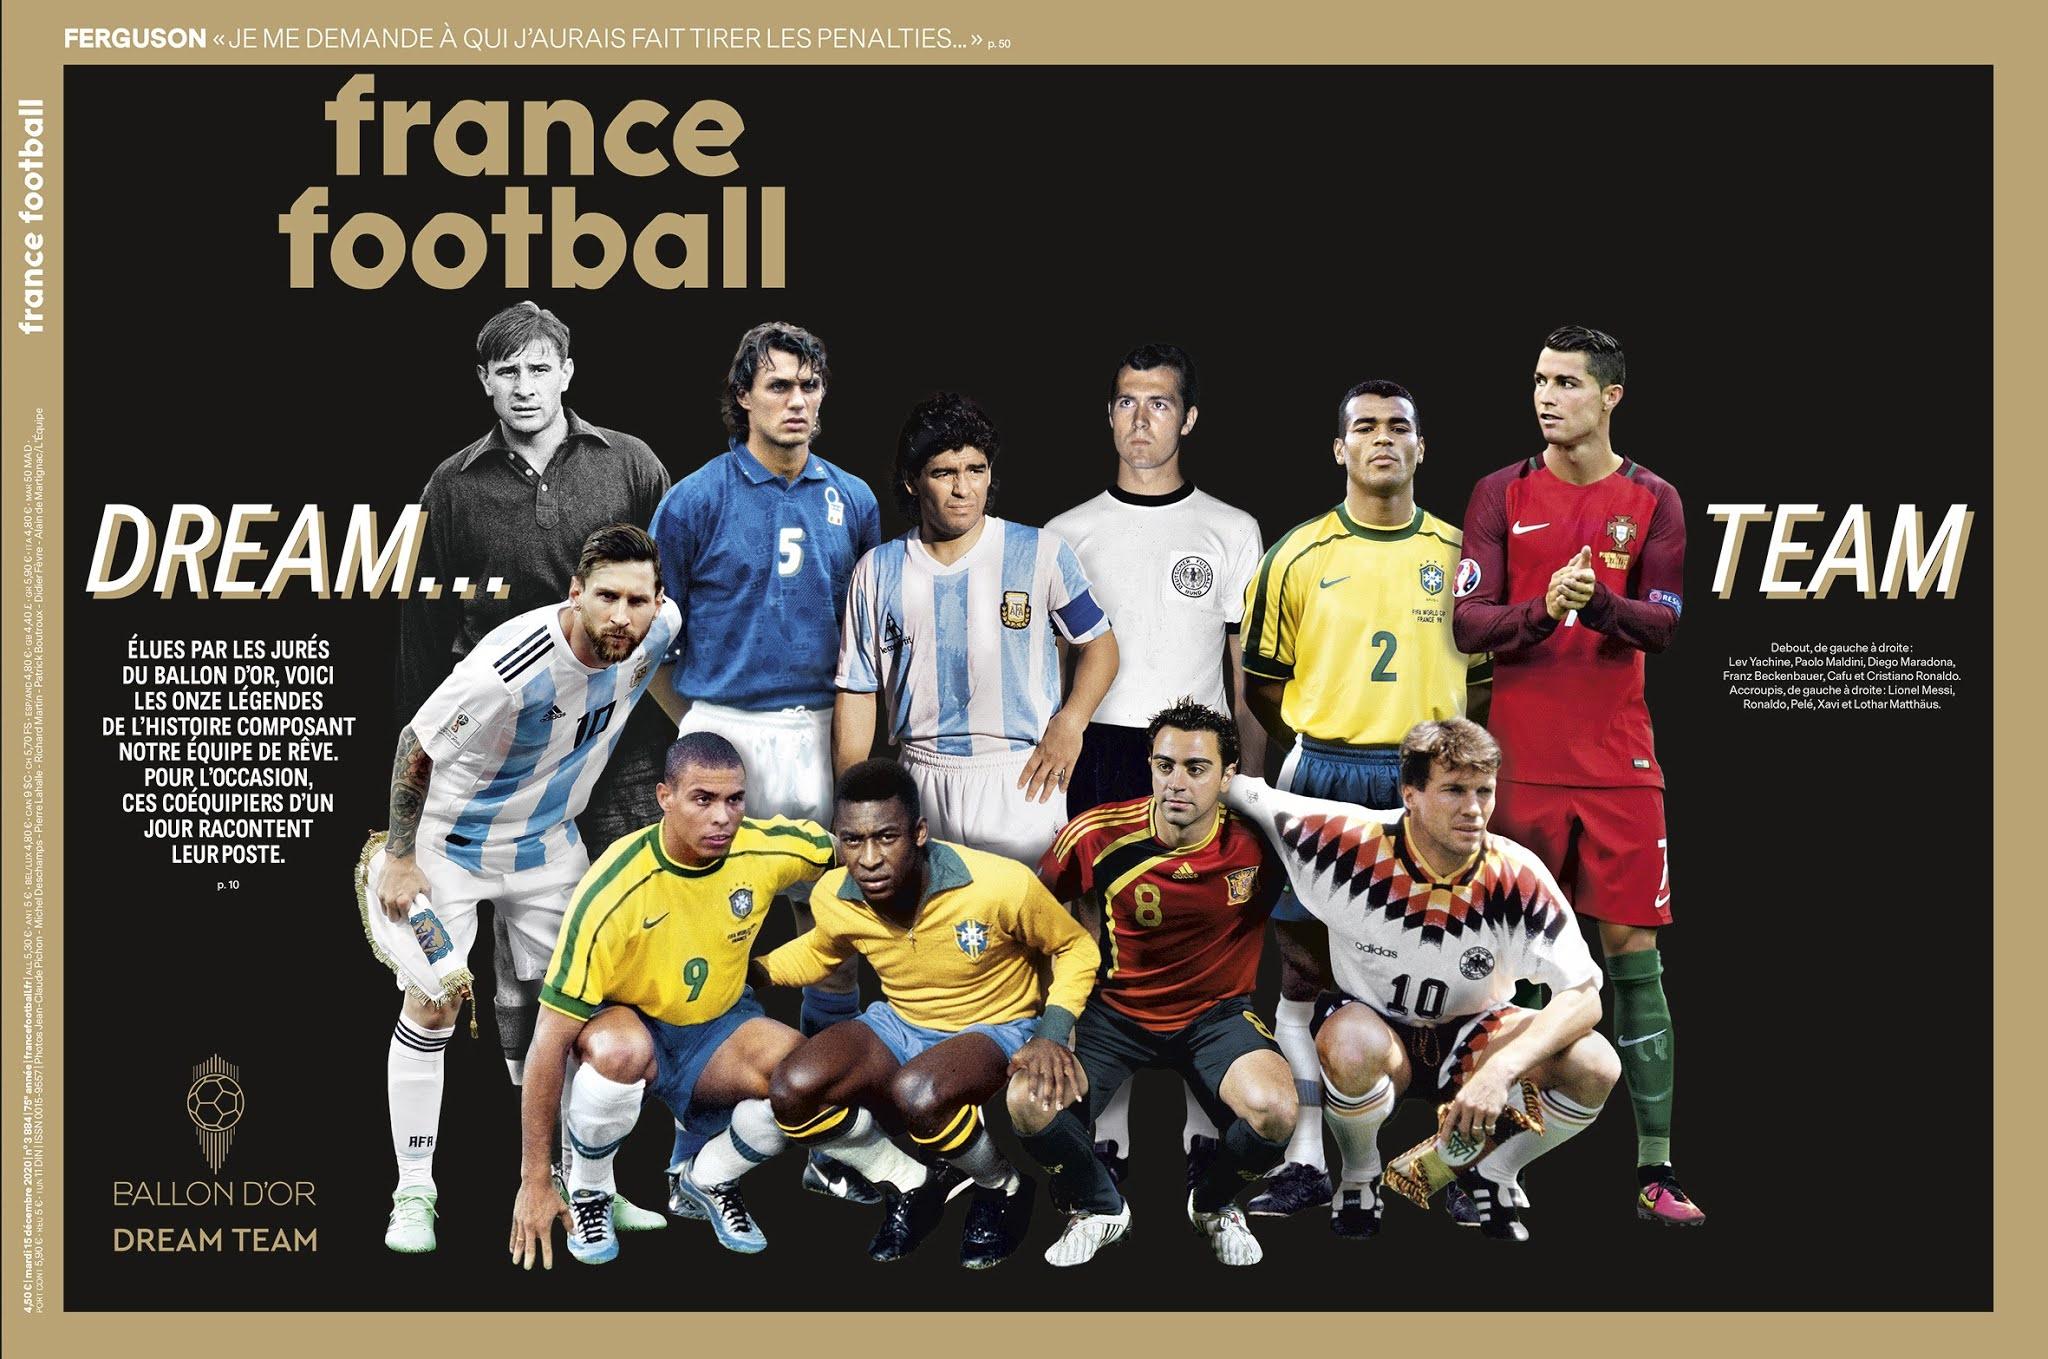 dream-team-france-football-2020